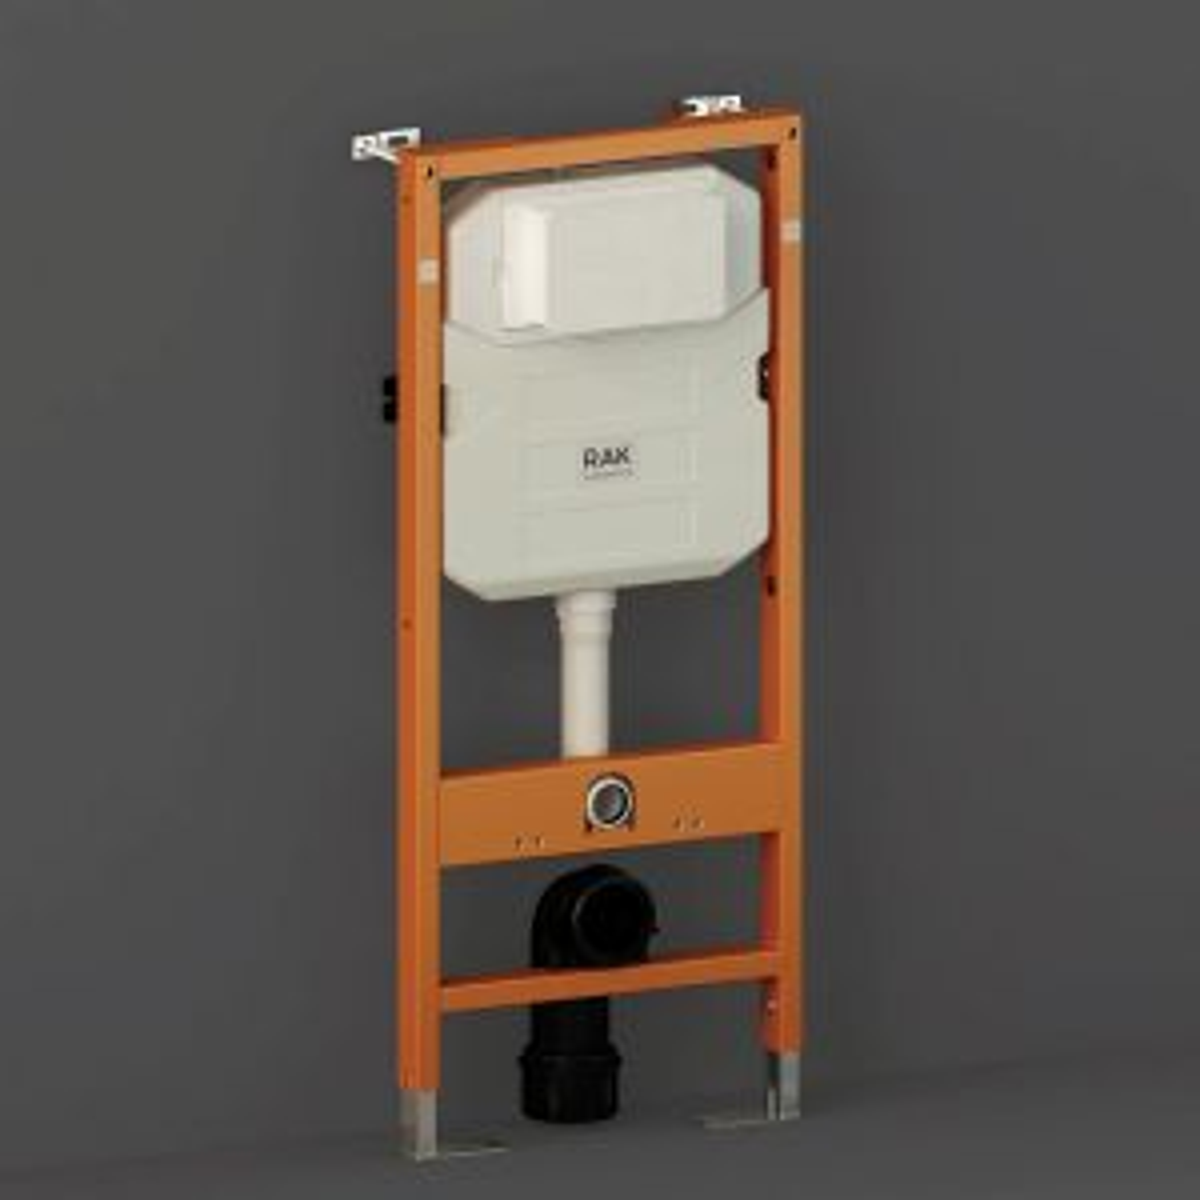 RAK Ecofix Regular Concealed Cistern with Metal Support Frame 500mm